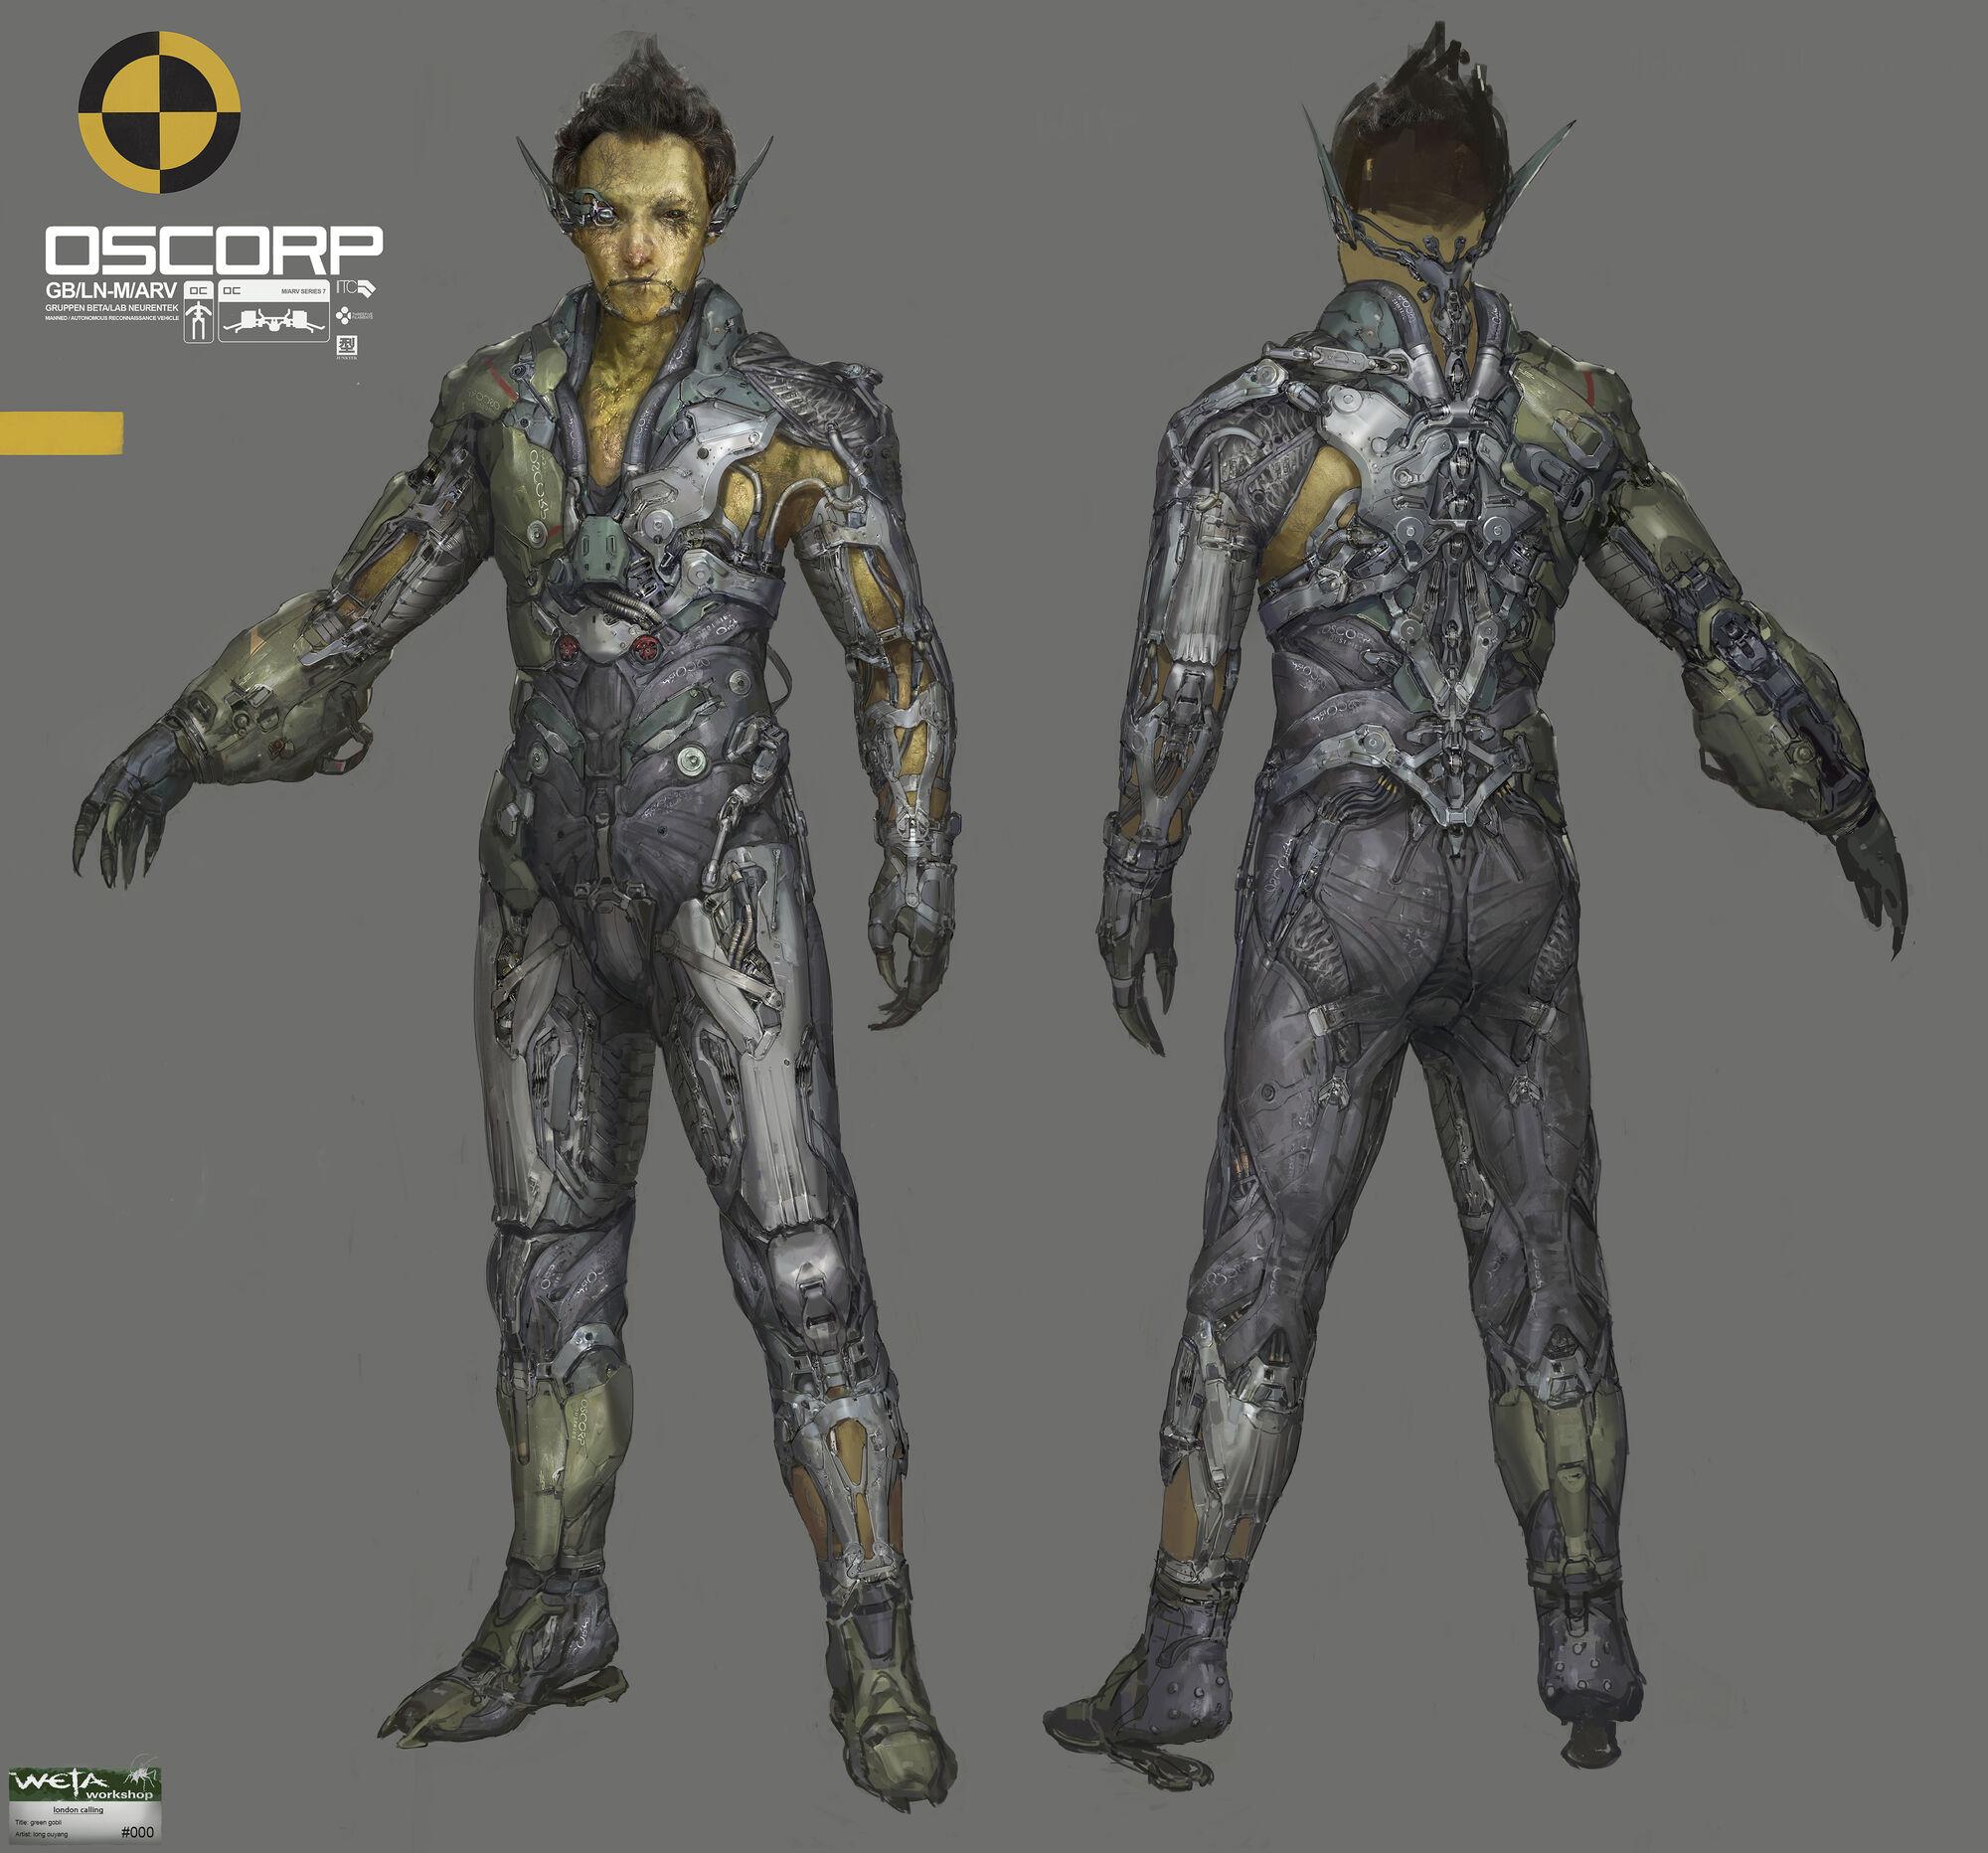 Image - The-amazing-spider-man-2 green-goblin-concept-art ...